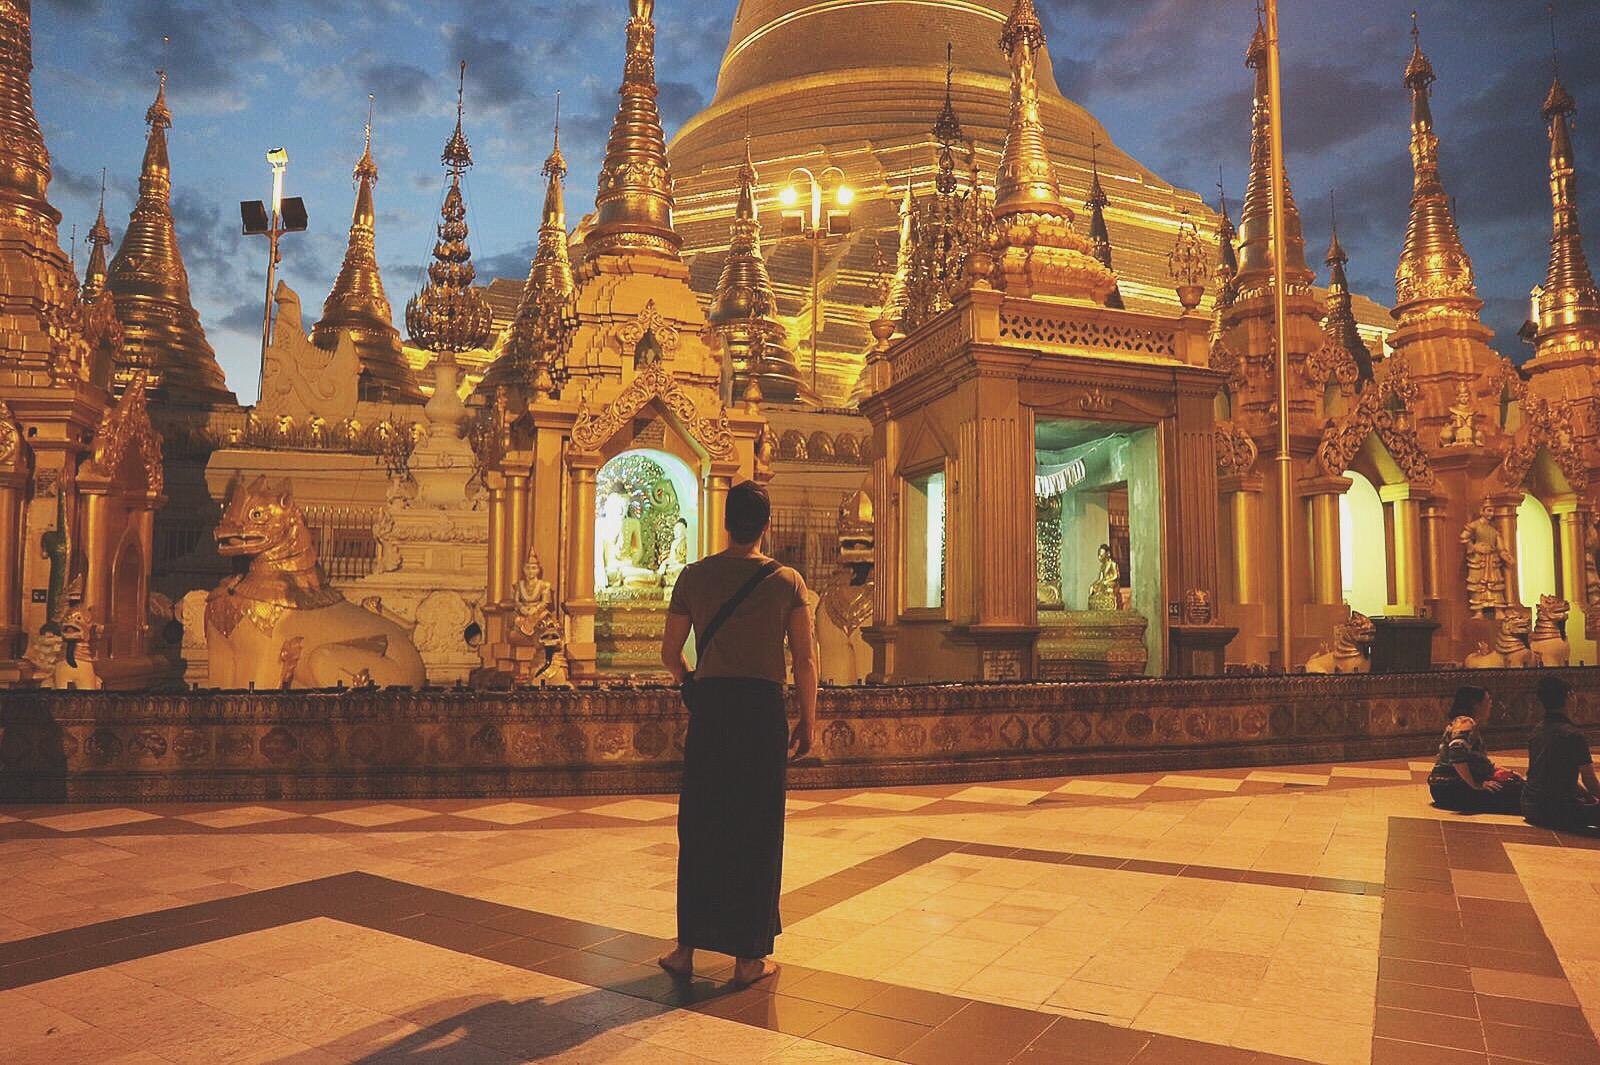 Thailand, Myanmar, Yangon, reizen, travel, route, blog, blogger, wanderlust